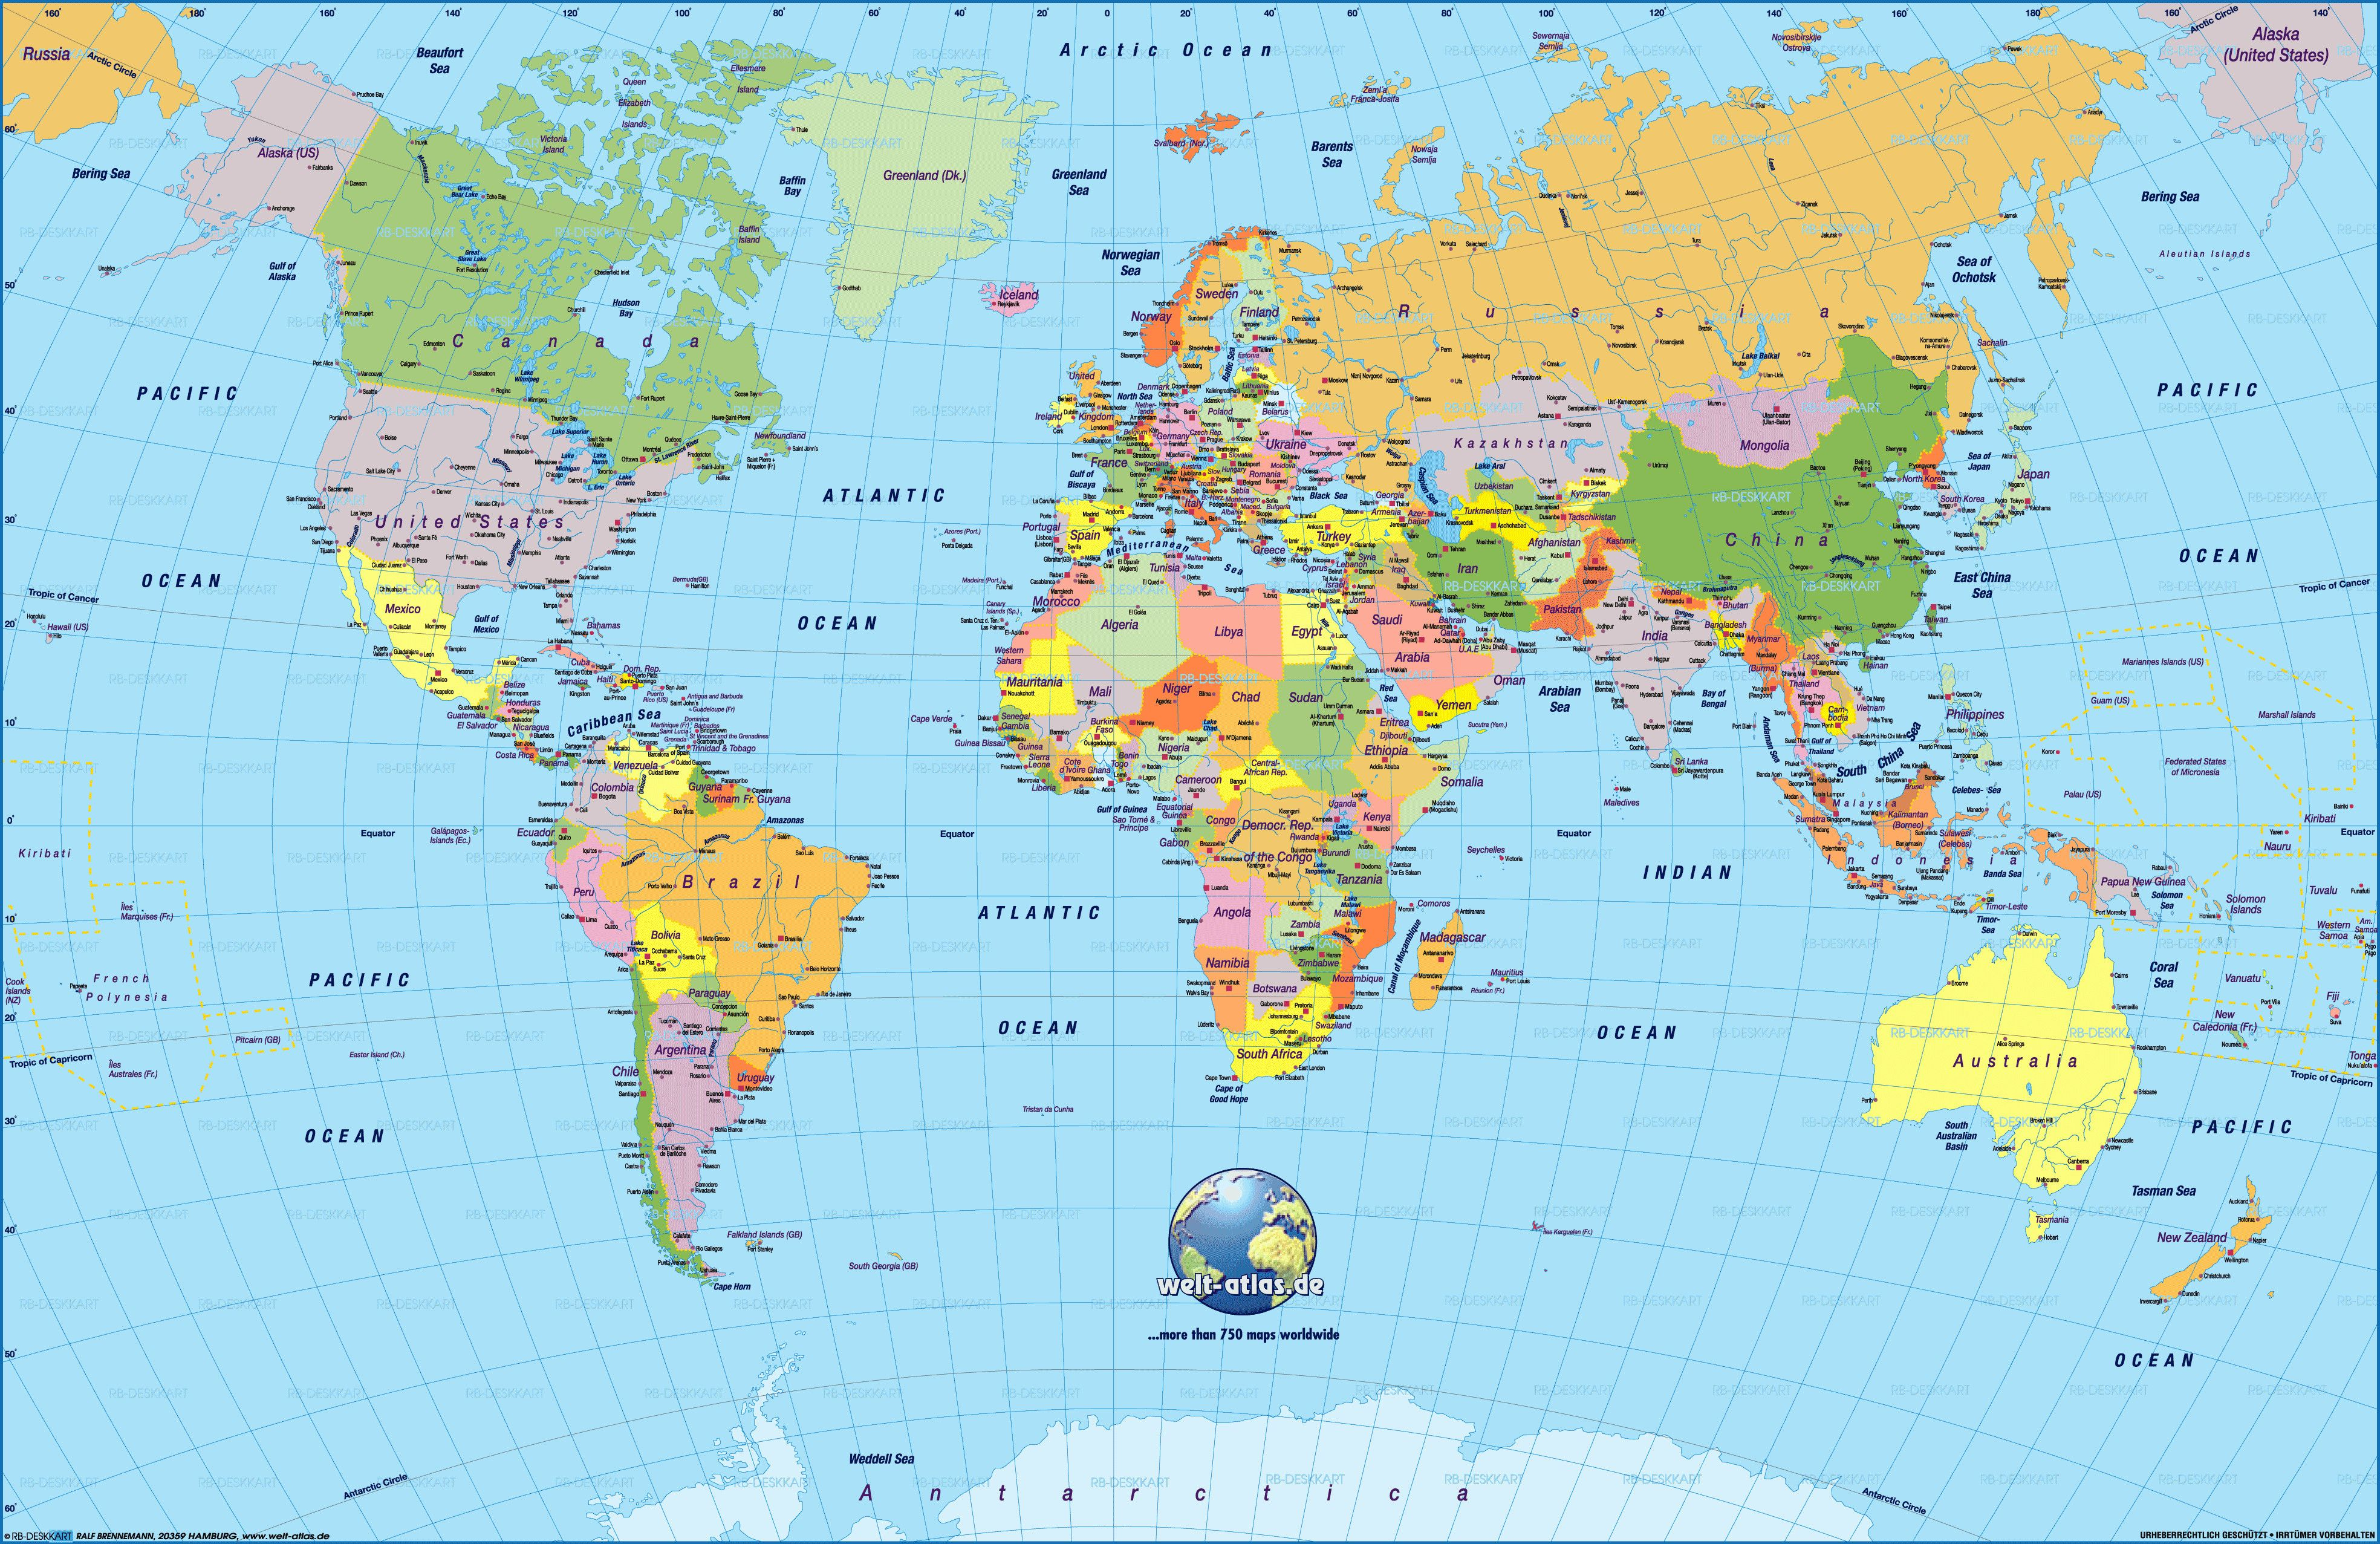 Printable World Map 2018 - 16.mackenzieinteriors.co • - Free Printable World Map